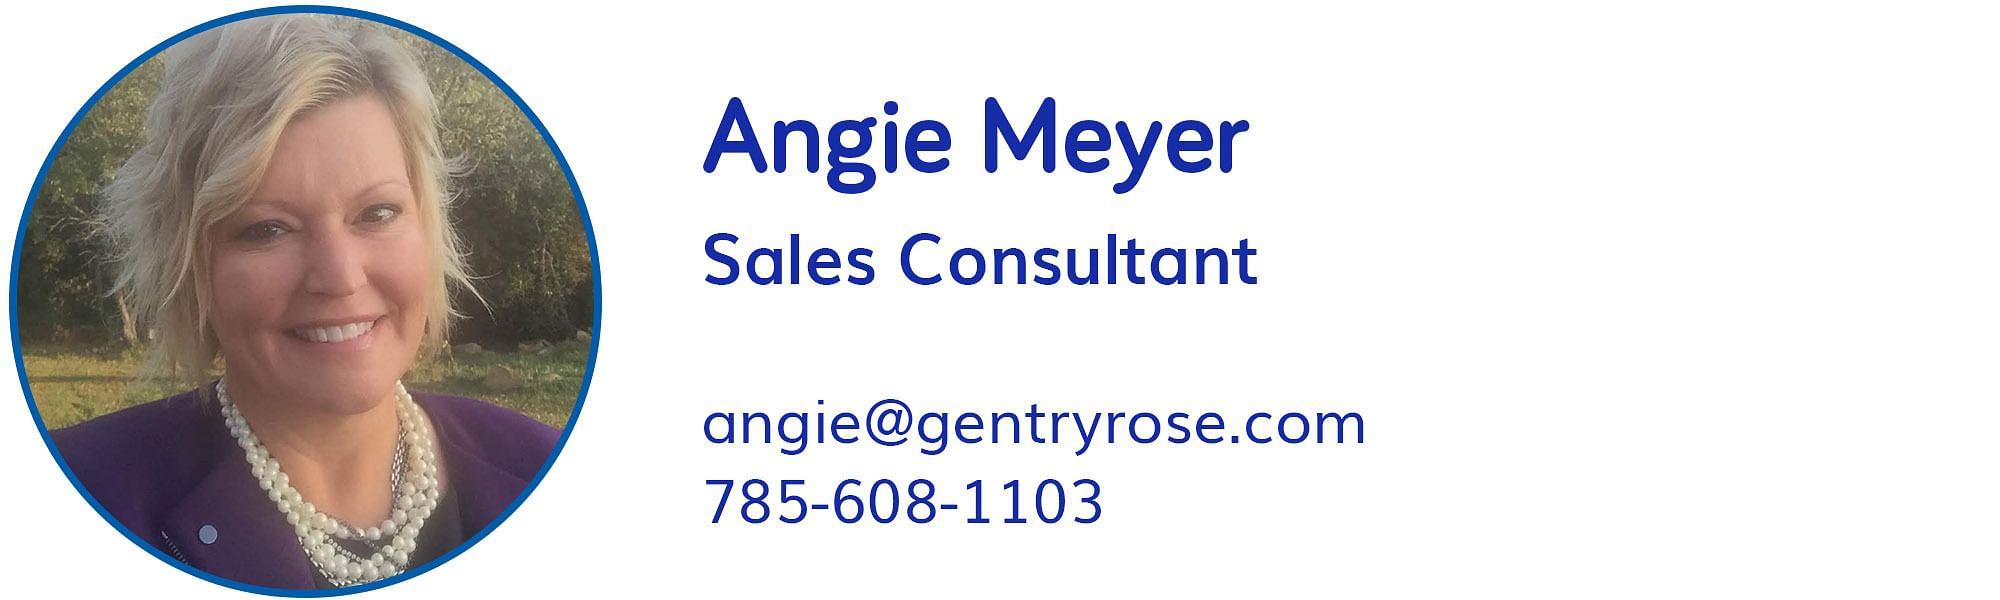 Angie Meyer, angie@gentryrose.com, 785-608-1103